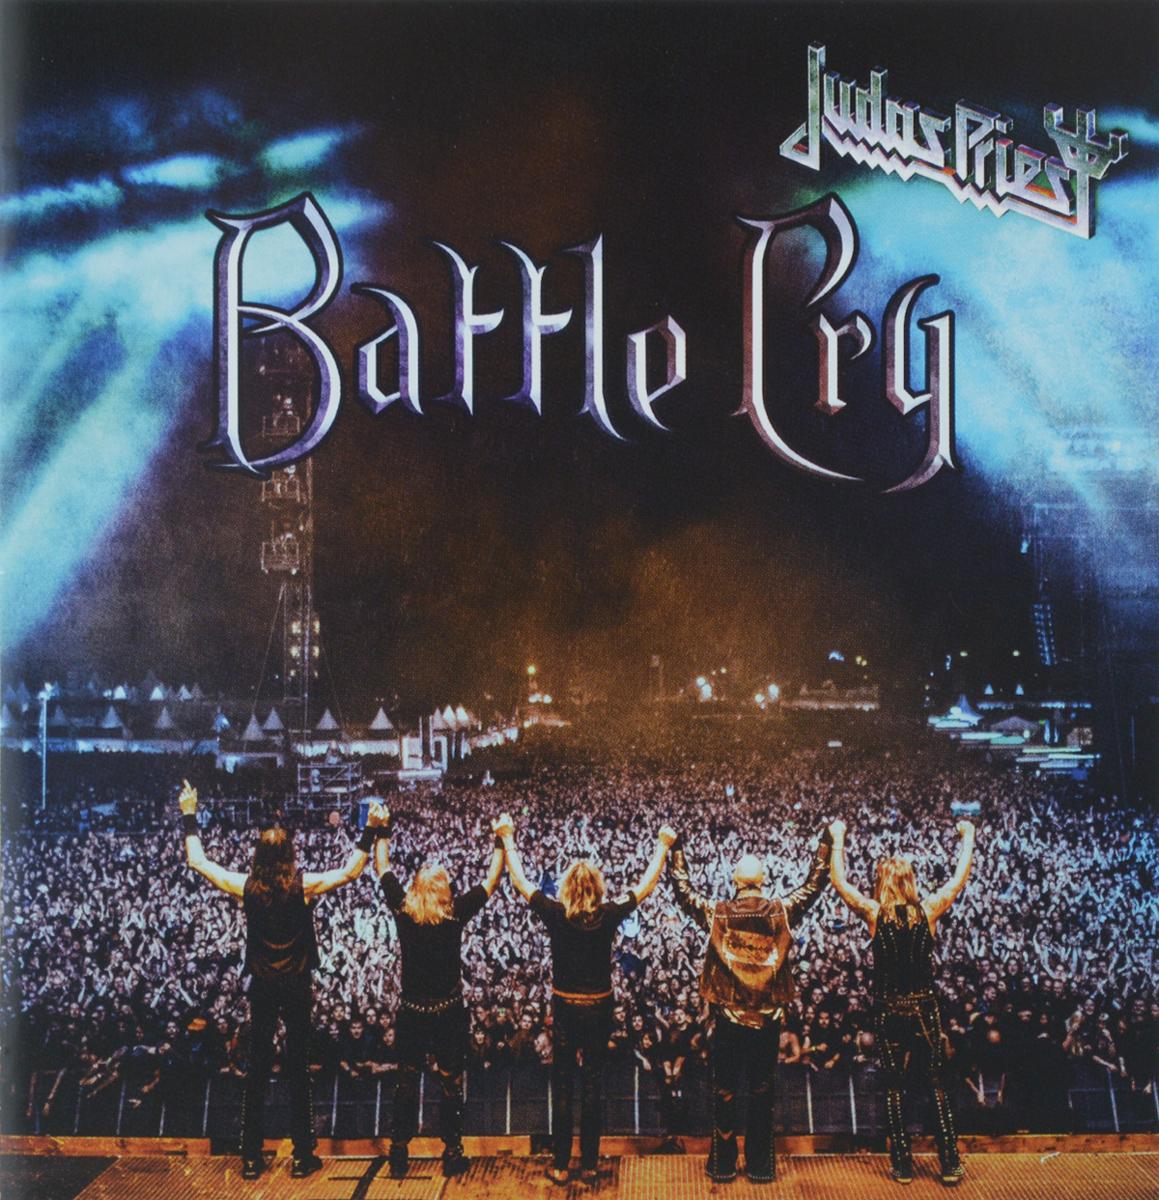 Judas Priest Judas Priest. Battle Cry judas priest judas priest angel of retribution 2 lp 180 gr